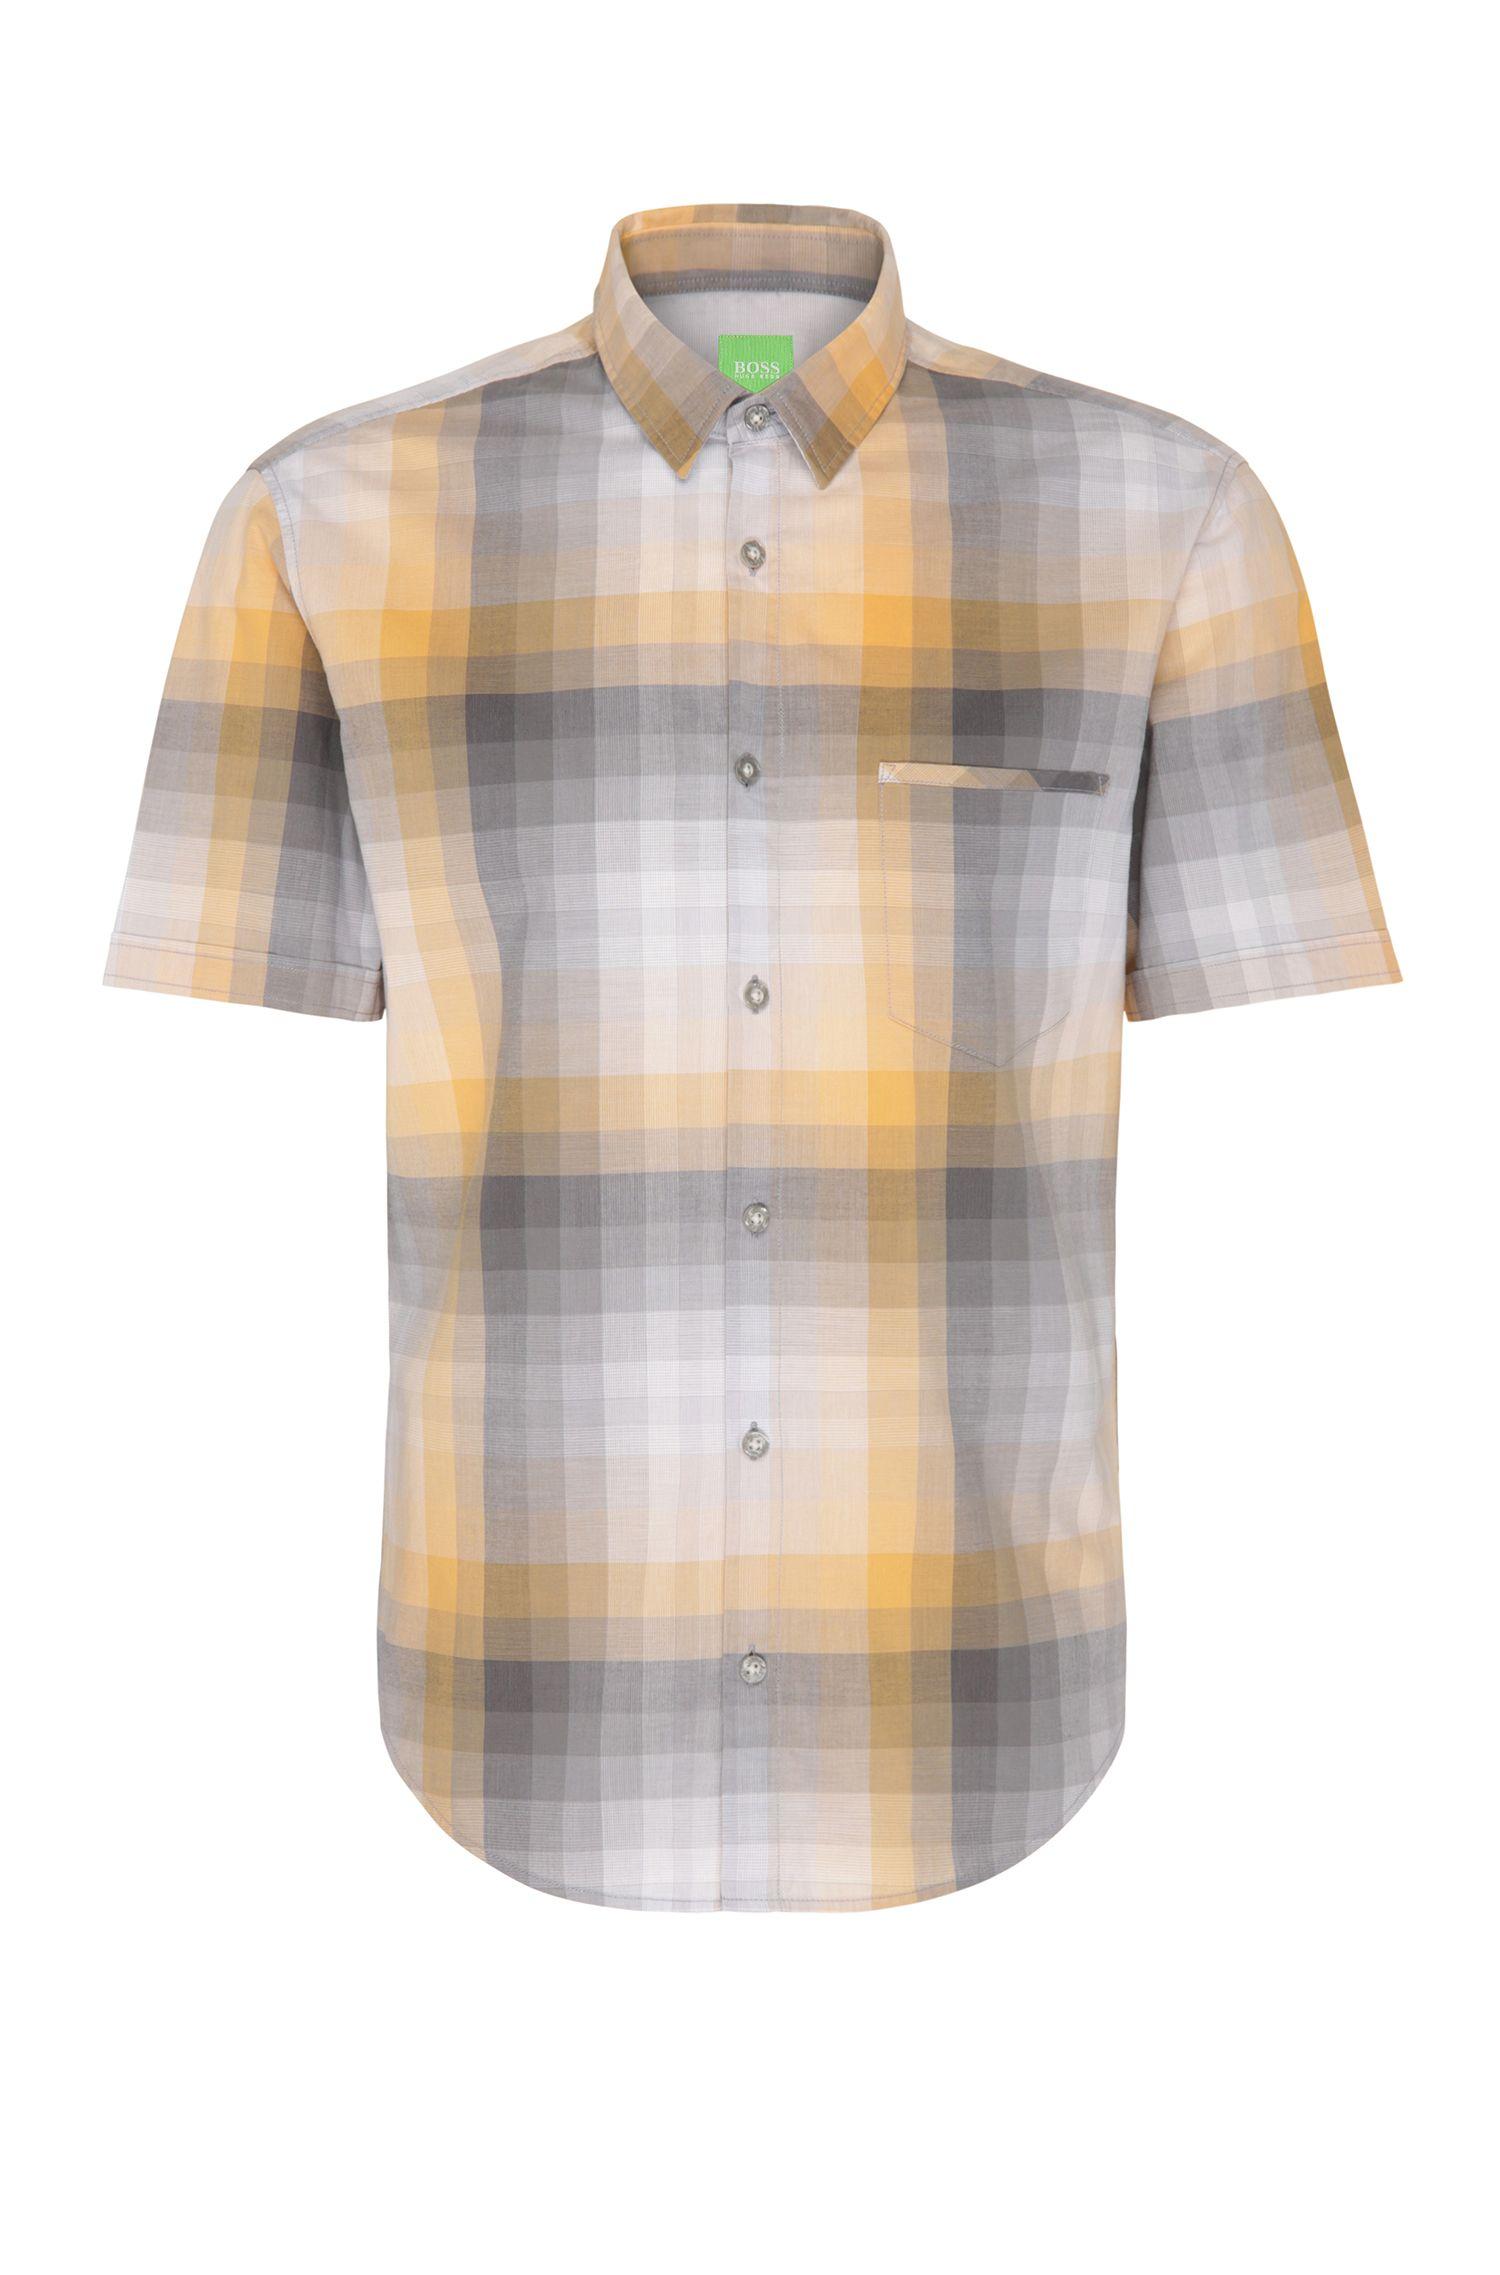 'C-Bansino' | Regular Fit, Gradient Checked Cotton Shirt